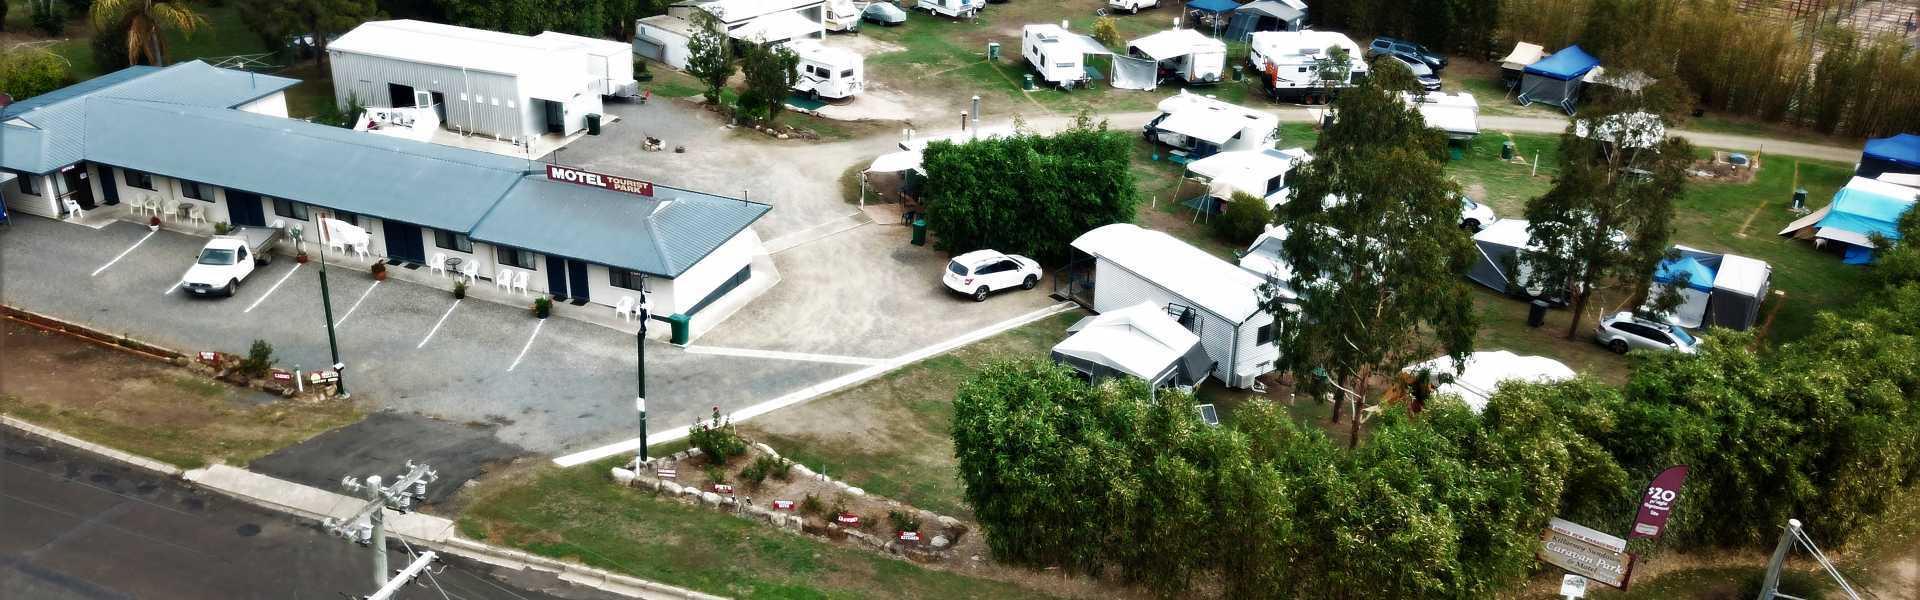 Kui Parks Killarney Sundown Motel & Tourist Park, Aerial Shot